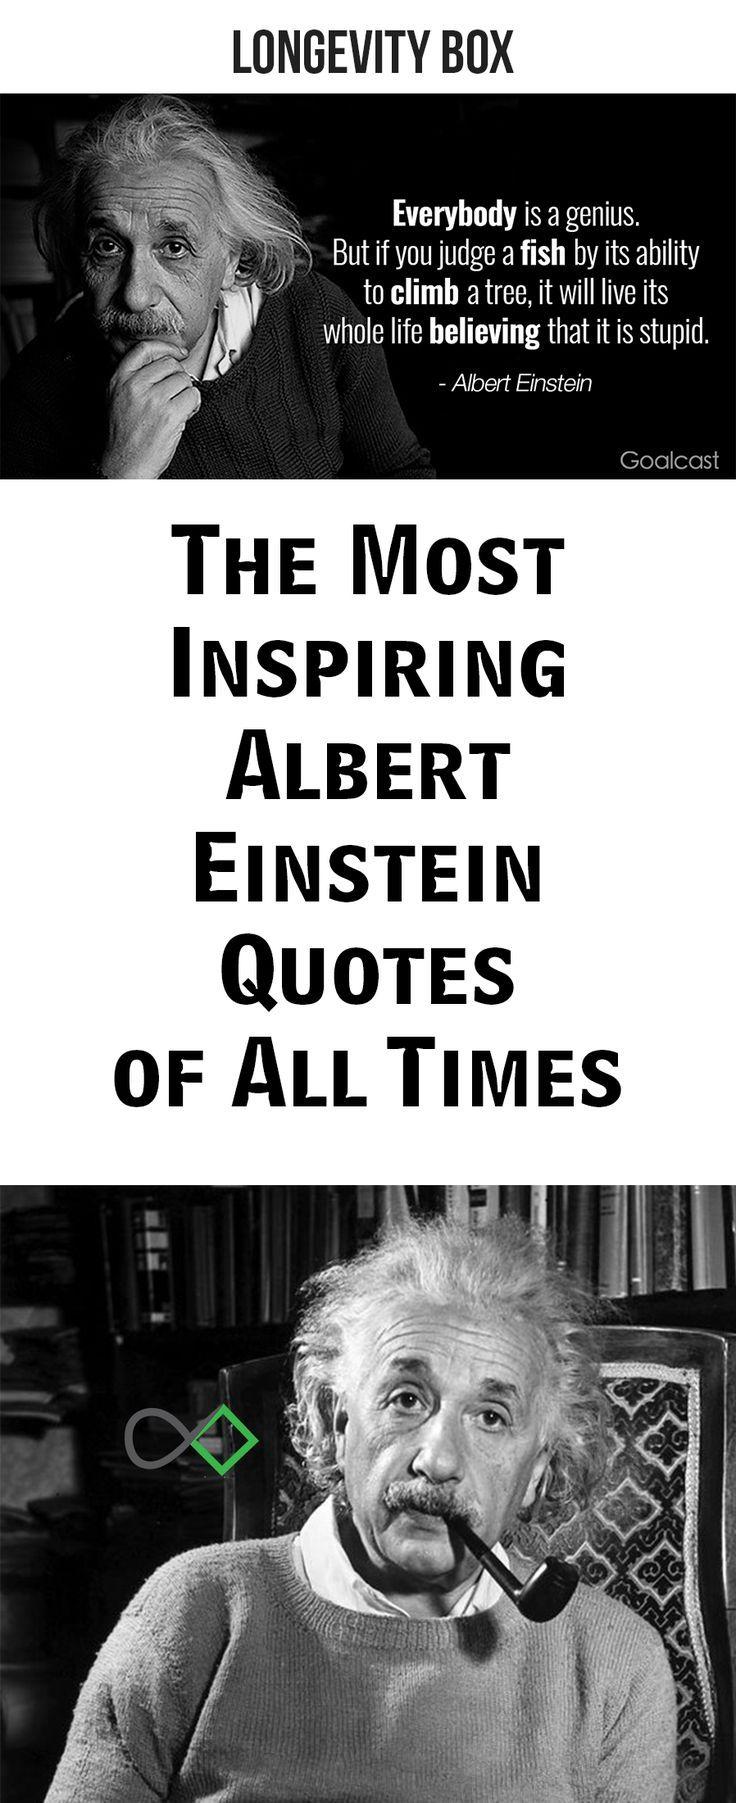 Top 30 Most Inspiring Albert Einstein Quotes Life Stories By